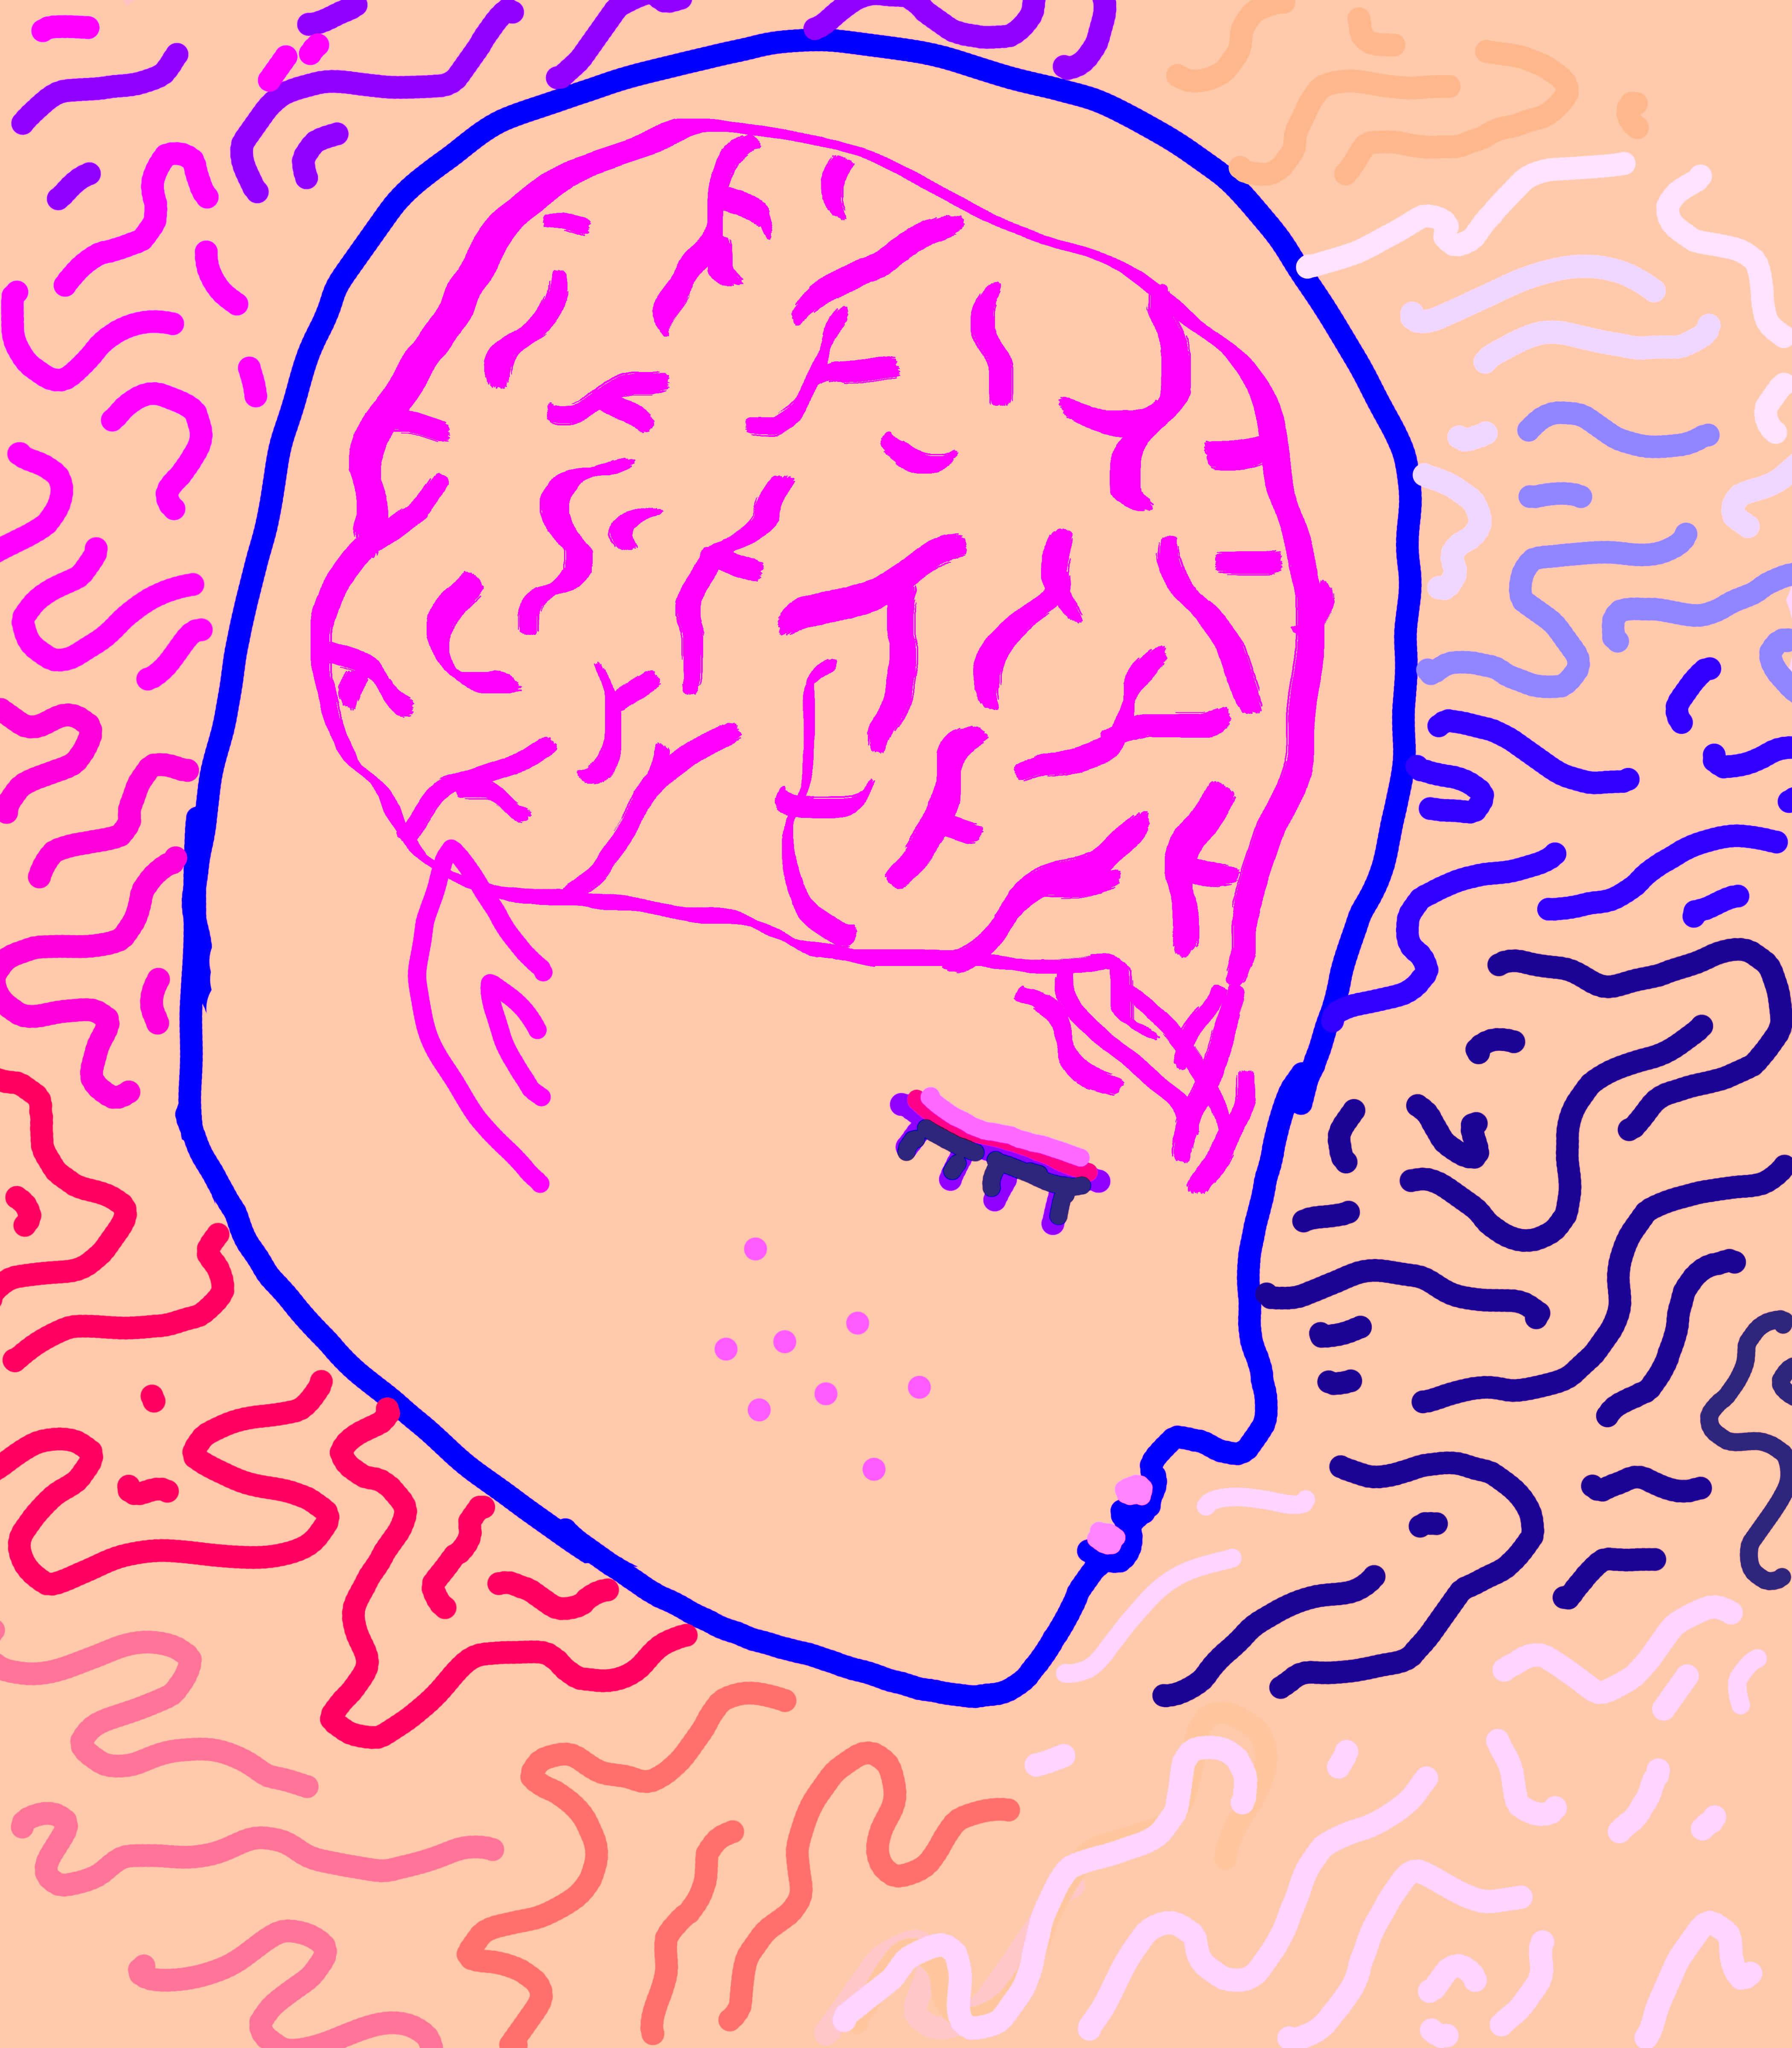 The human brain is a li'l horrifying. —Isabella